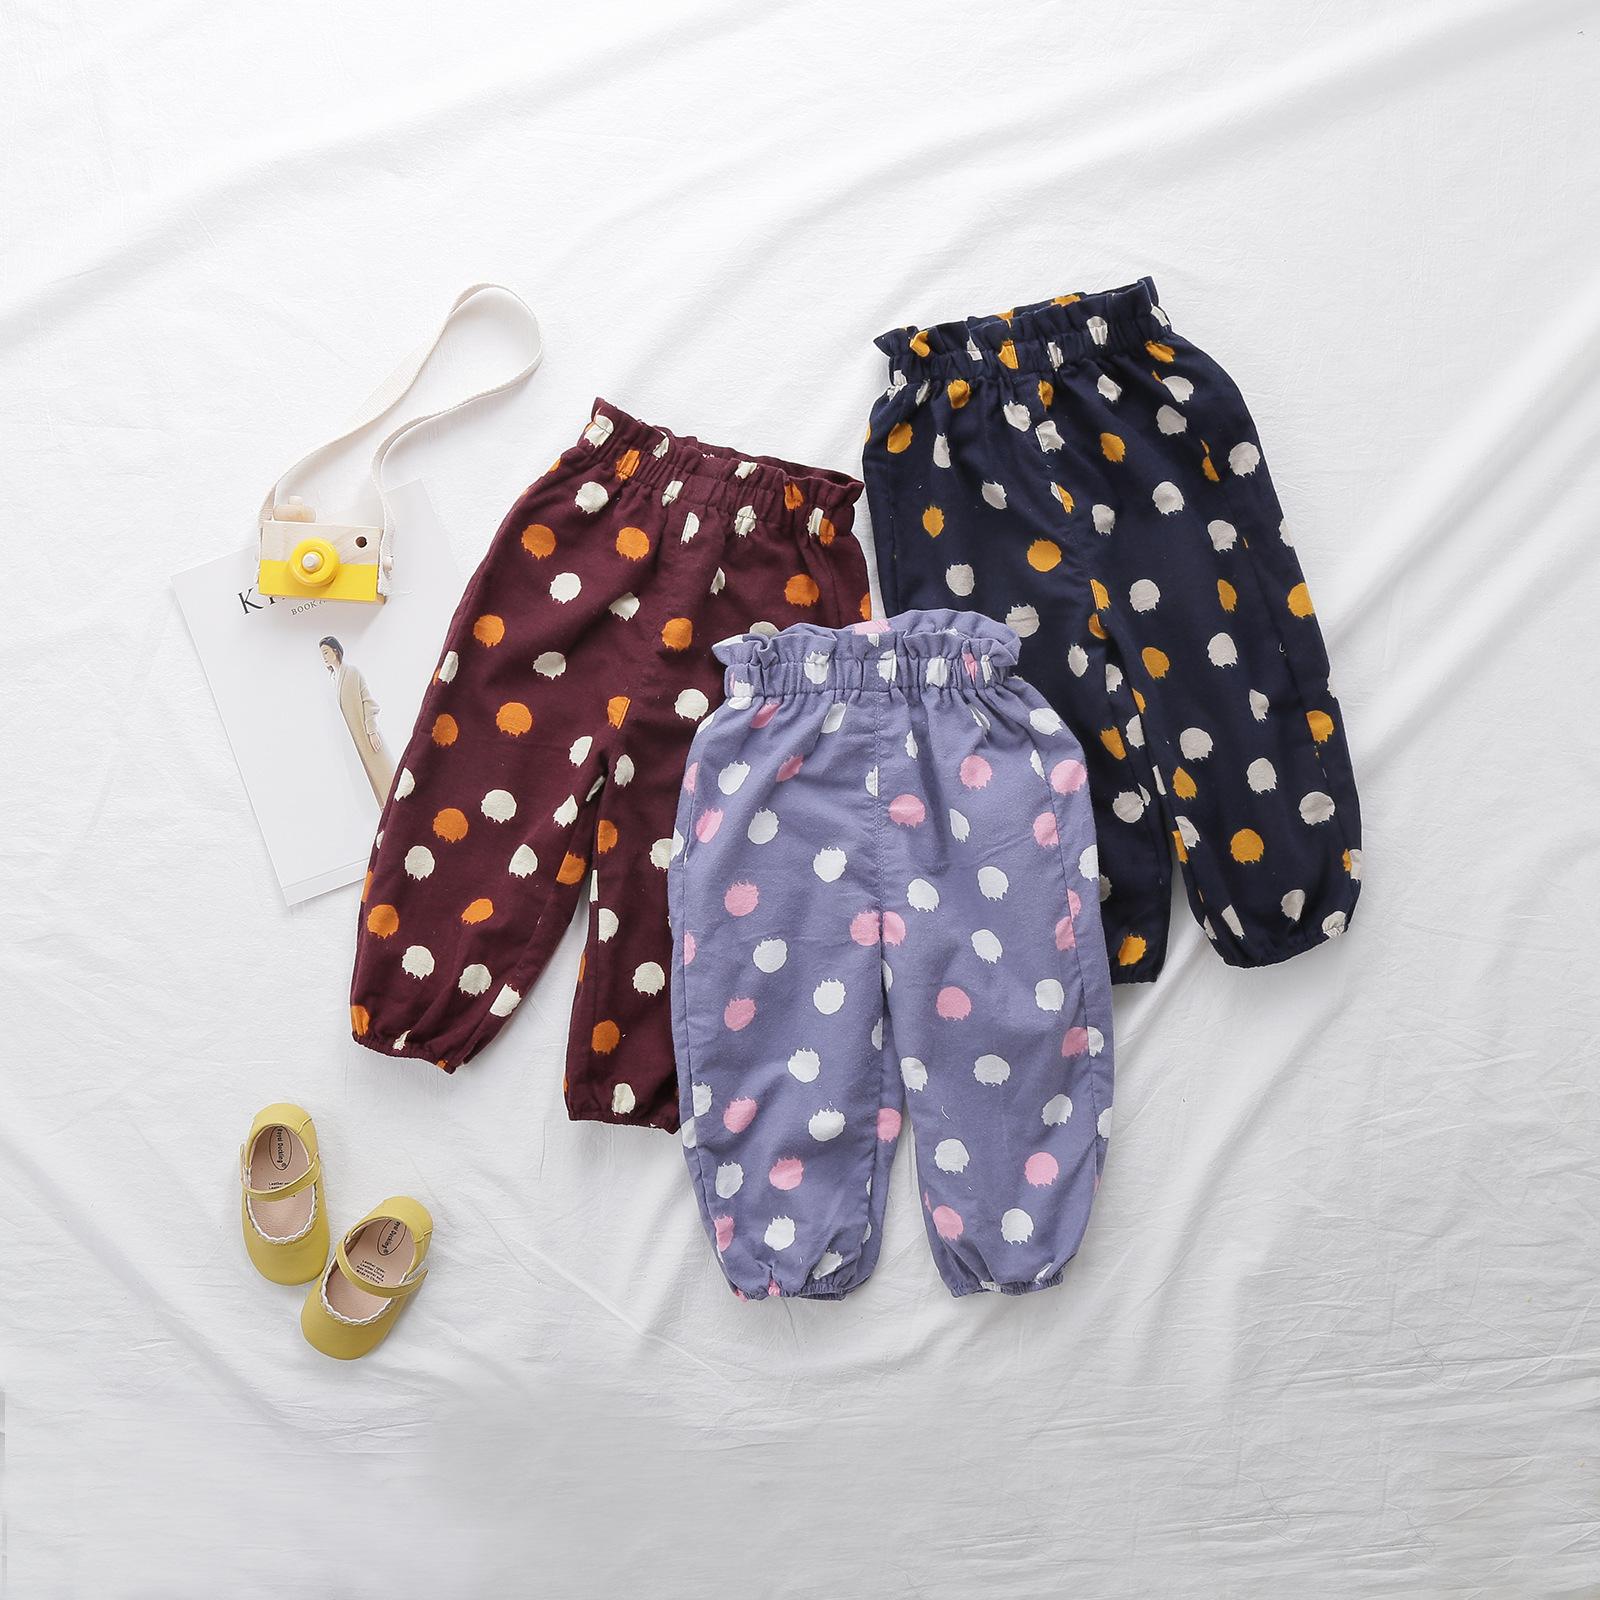 Baby Girls Pants Kids Girl Cotton Colorful Dot Printed Vintage Roupas Infantis Bottoms Trousers Long Pants Toddler Girl Clothes